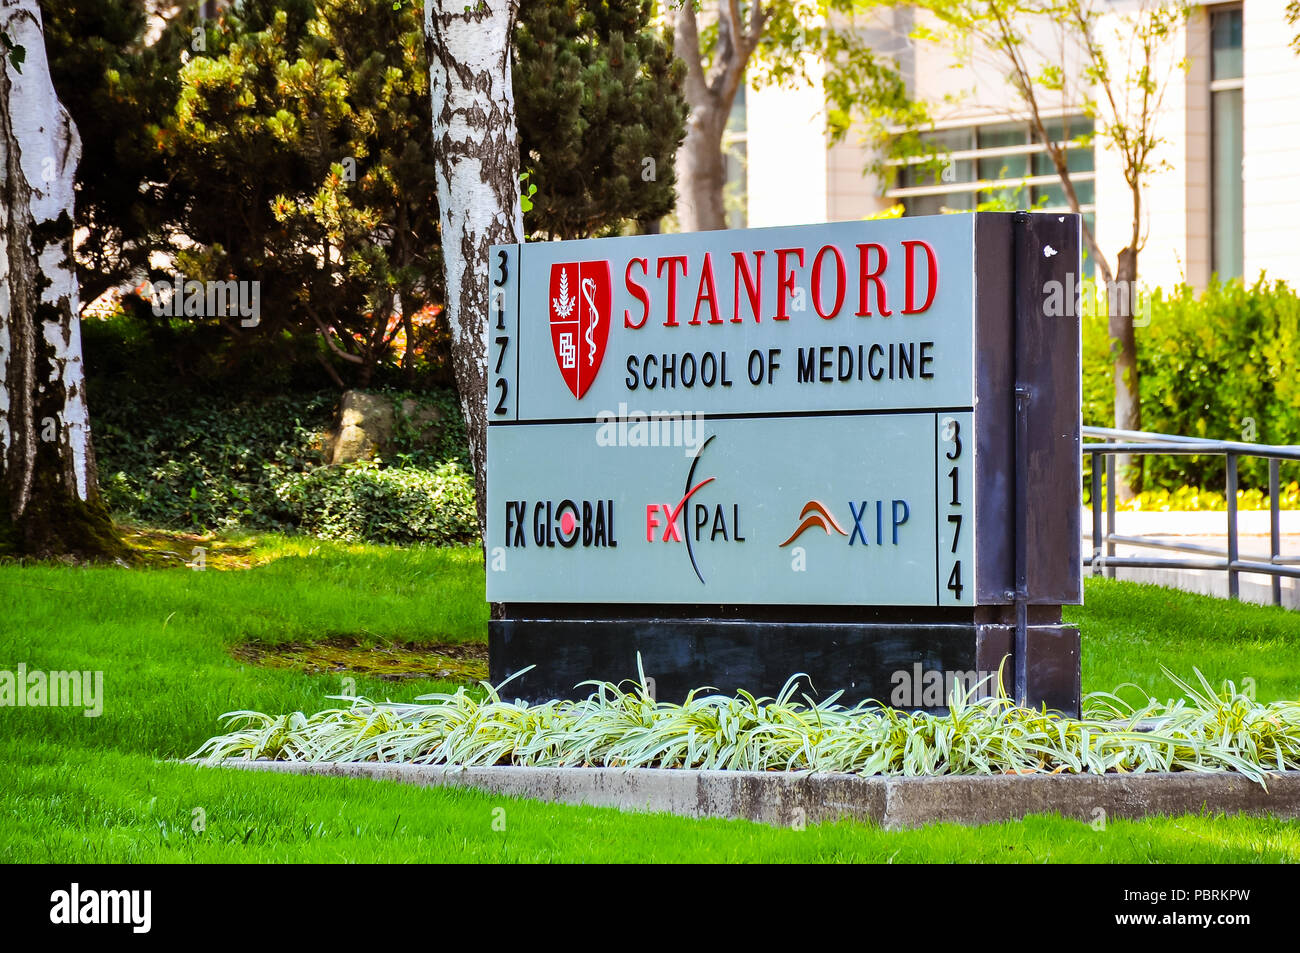 Stanford, CA - Aug. 20, 2017: Stanford University School of Medicine - it is the medical school of Stanford University and is located in Stanford, CA. - Stock Image